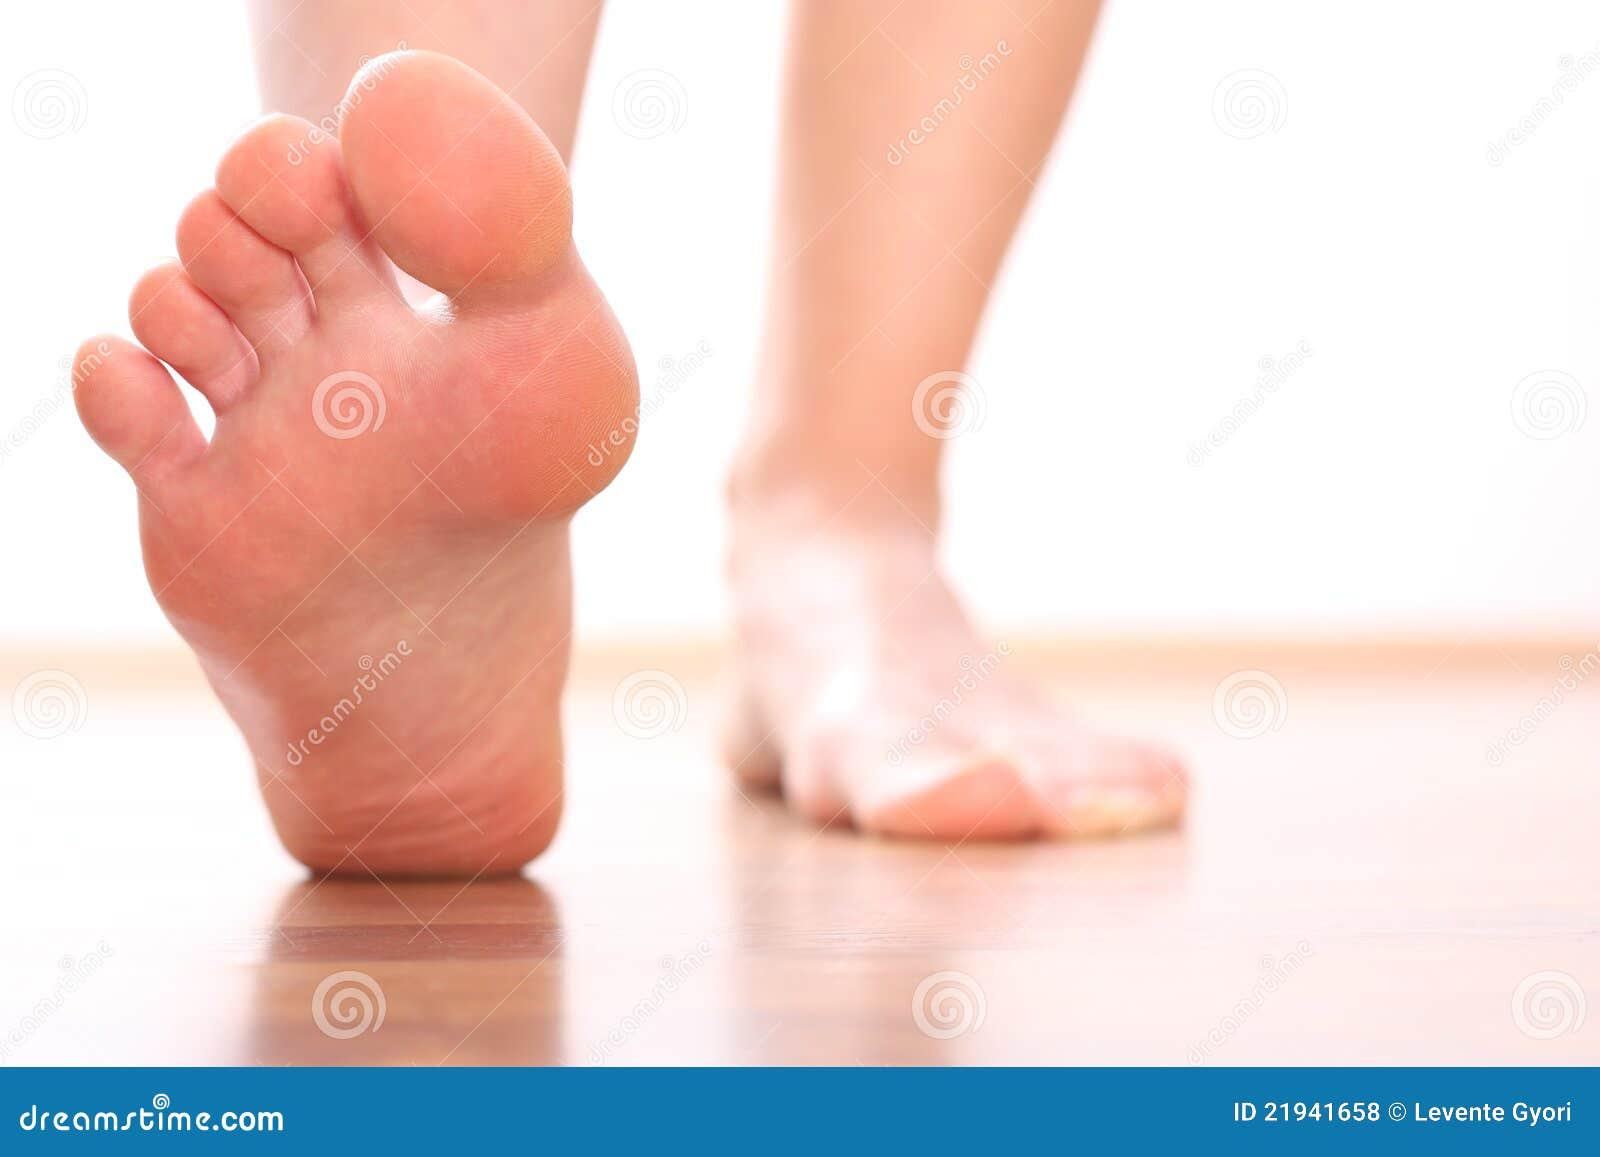 Foot stepping closeup woman legs